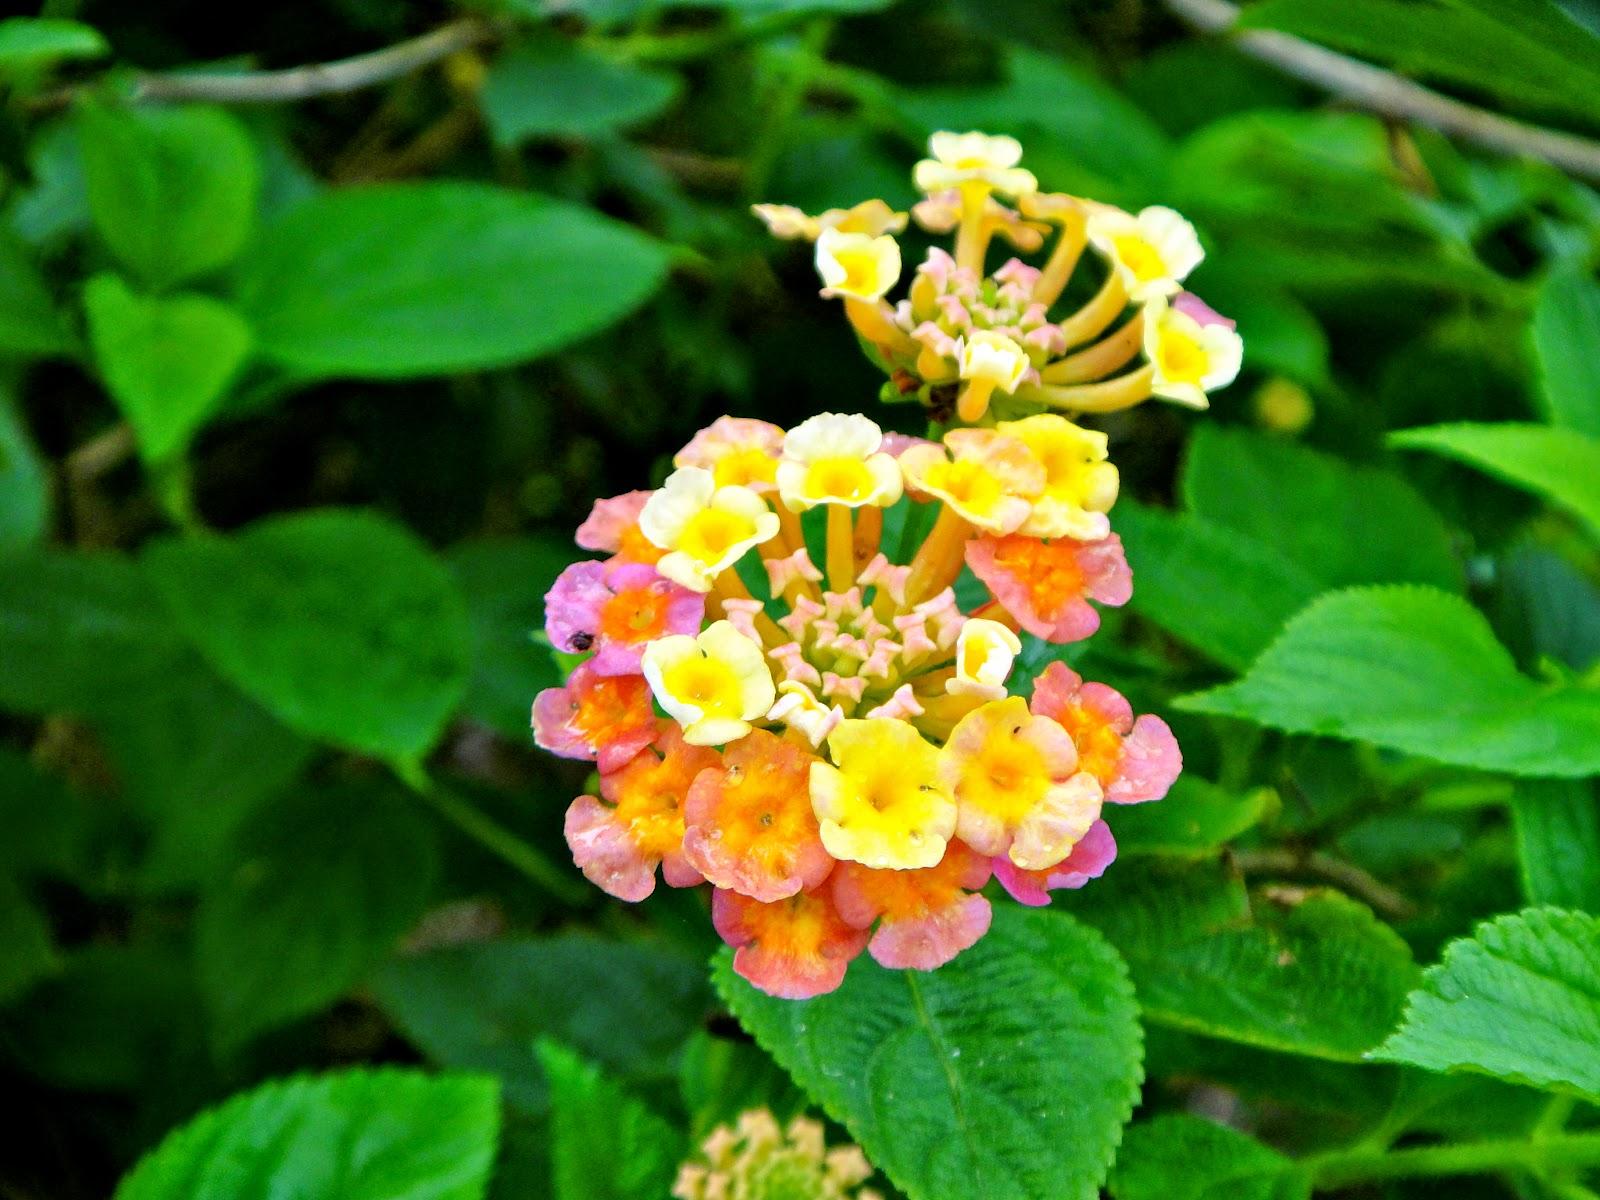 Flowers at Pine Garden Hualien Taiwan